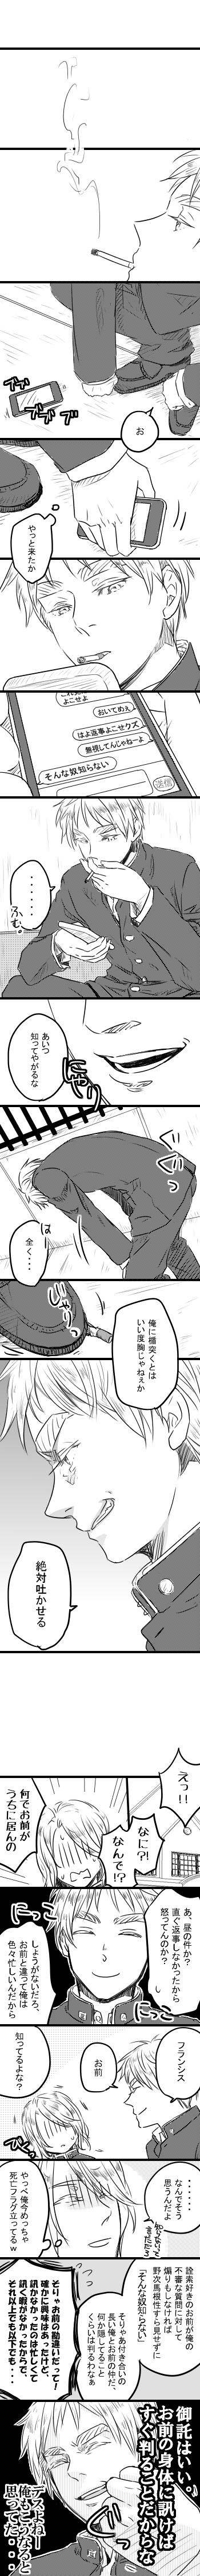 S学パロ_幼馴染2